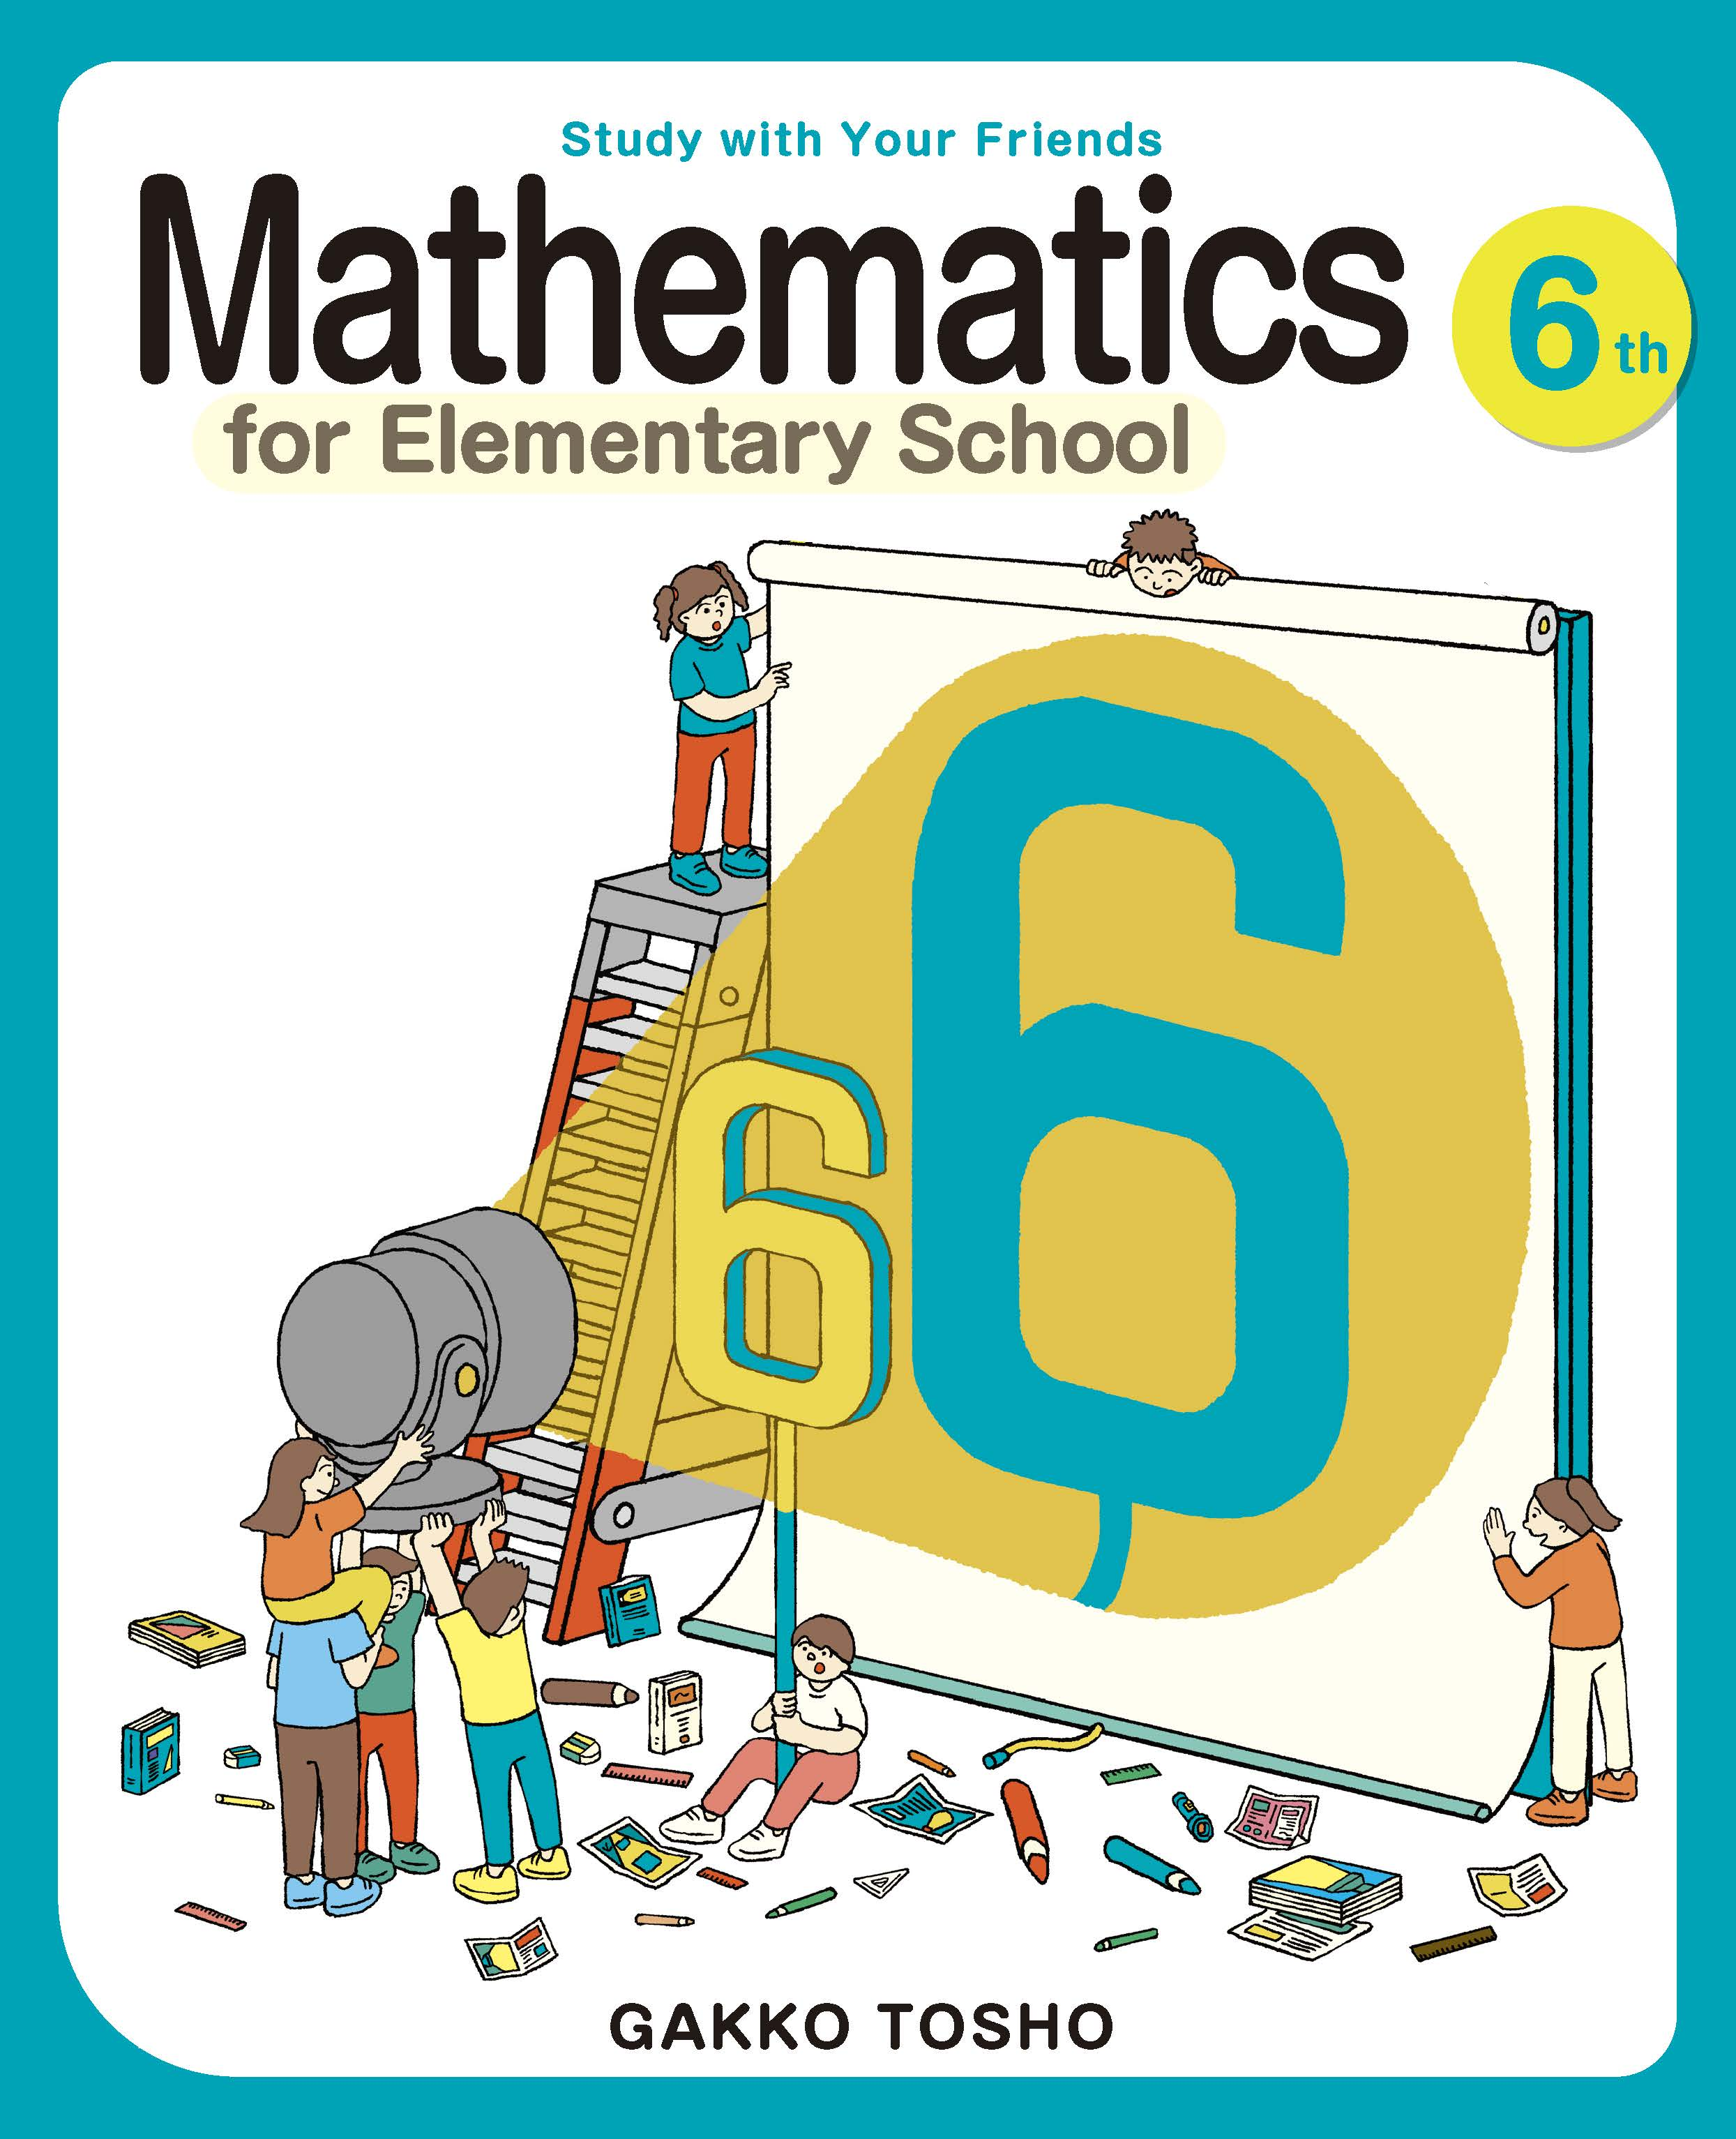 令和2年版 算数教科書英訳本6年 算数英訳本 MATHEMATICS 6th Grade